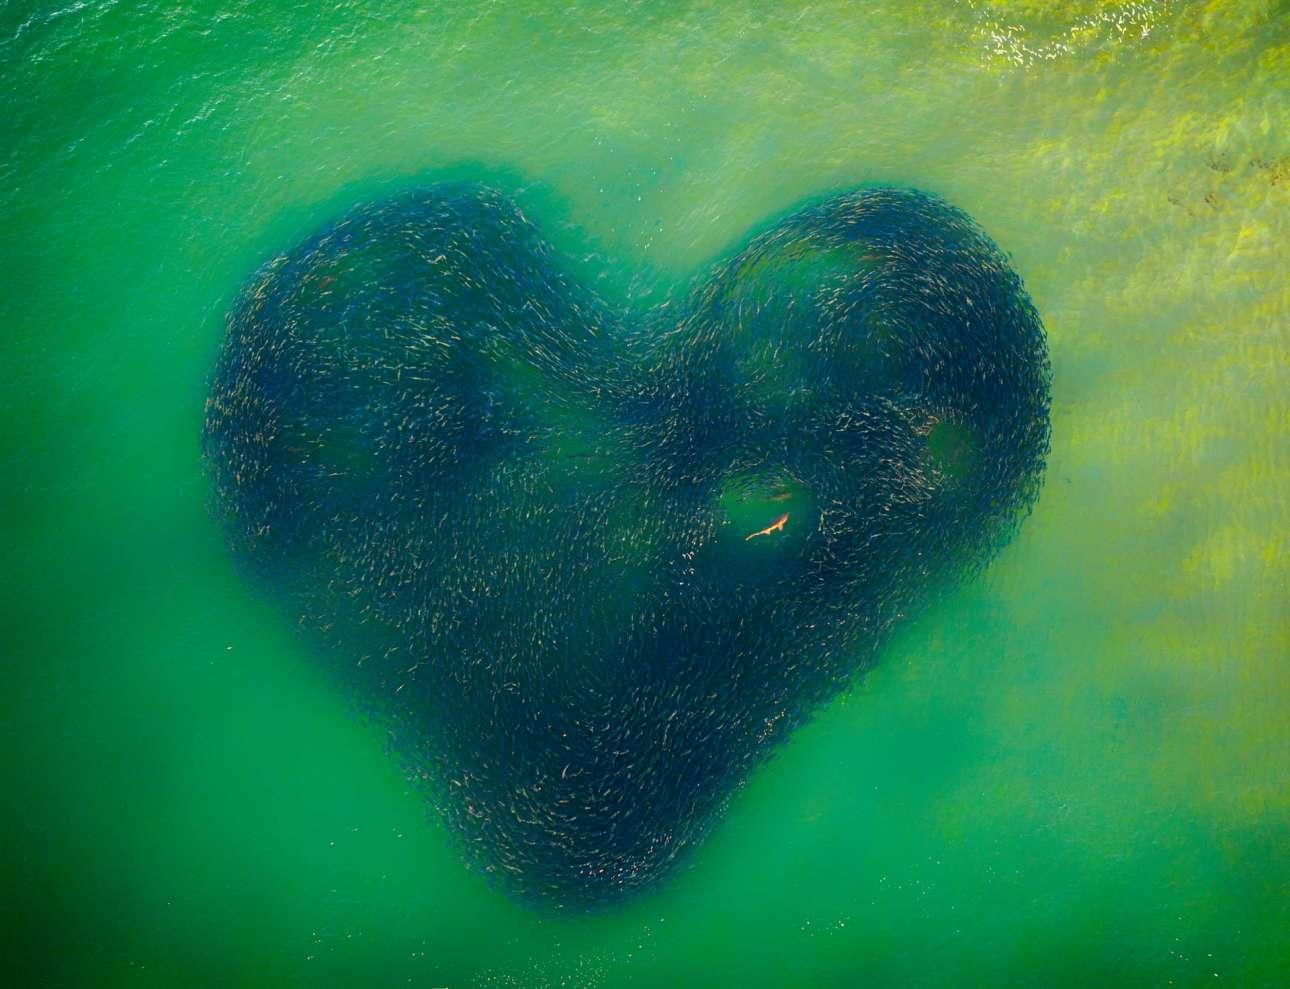 O μεγάλος νικητής του διαγωνισμού: κοπάδι σολομών σχηματίζει μια καρδιά με έναν καρχαρία να κολυμπάει μέσα της...